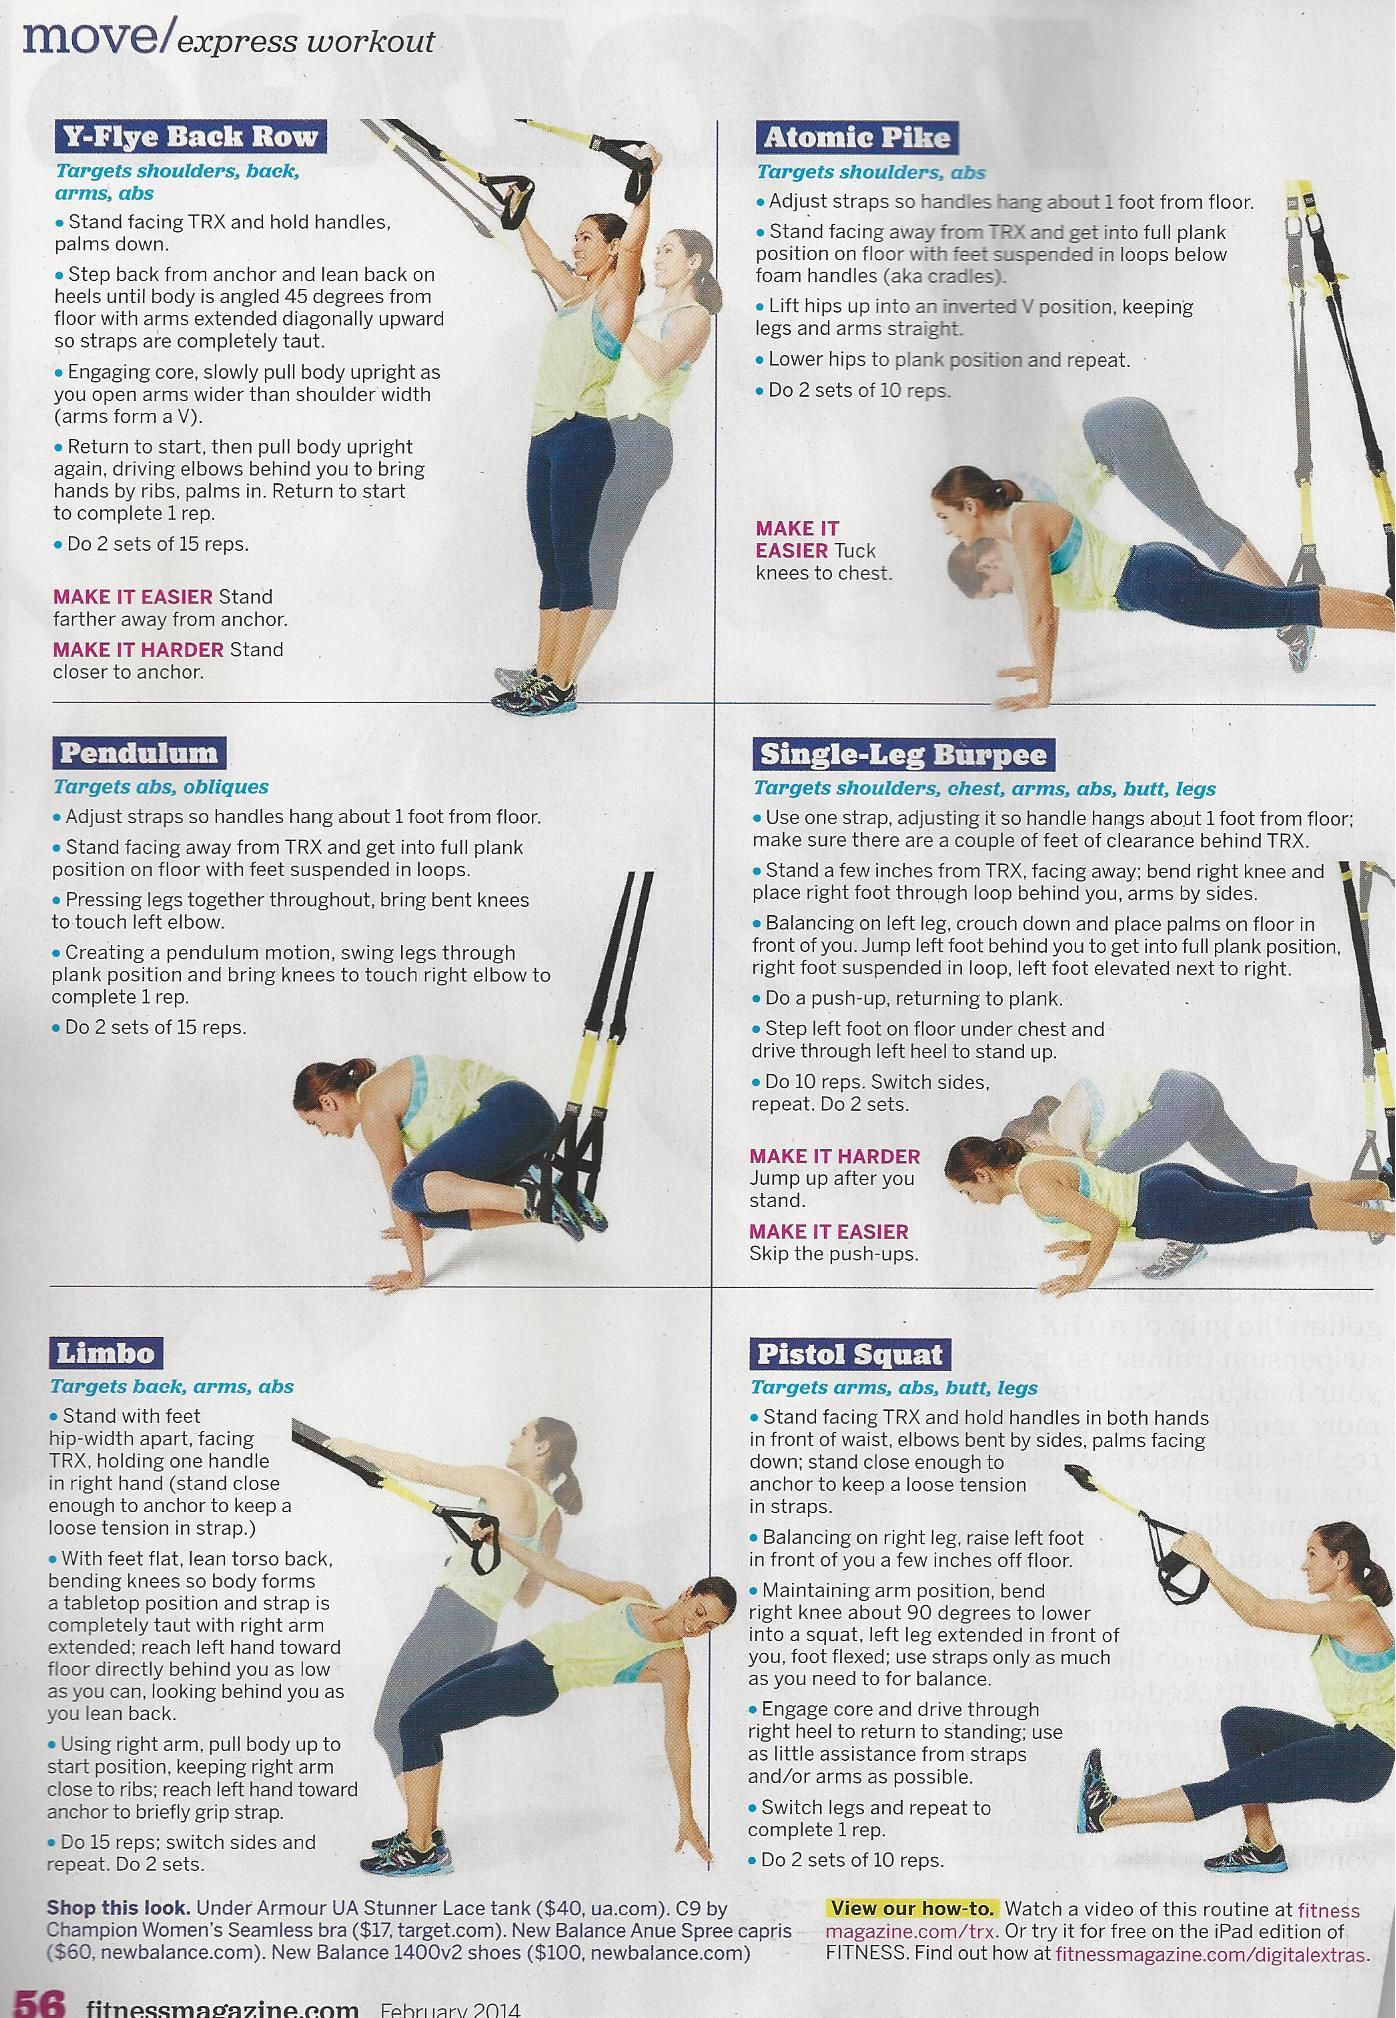 Trx Exercises Pdf : exercises, Workouts, Health, Fitness, Training, Workouts,, Workout, Women